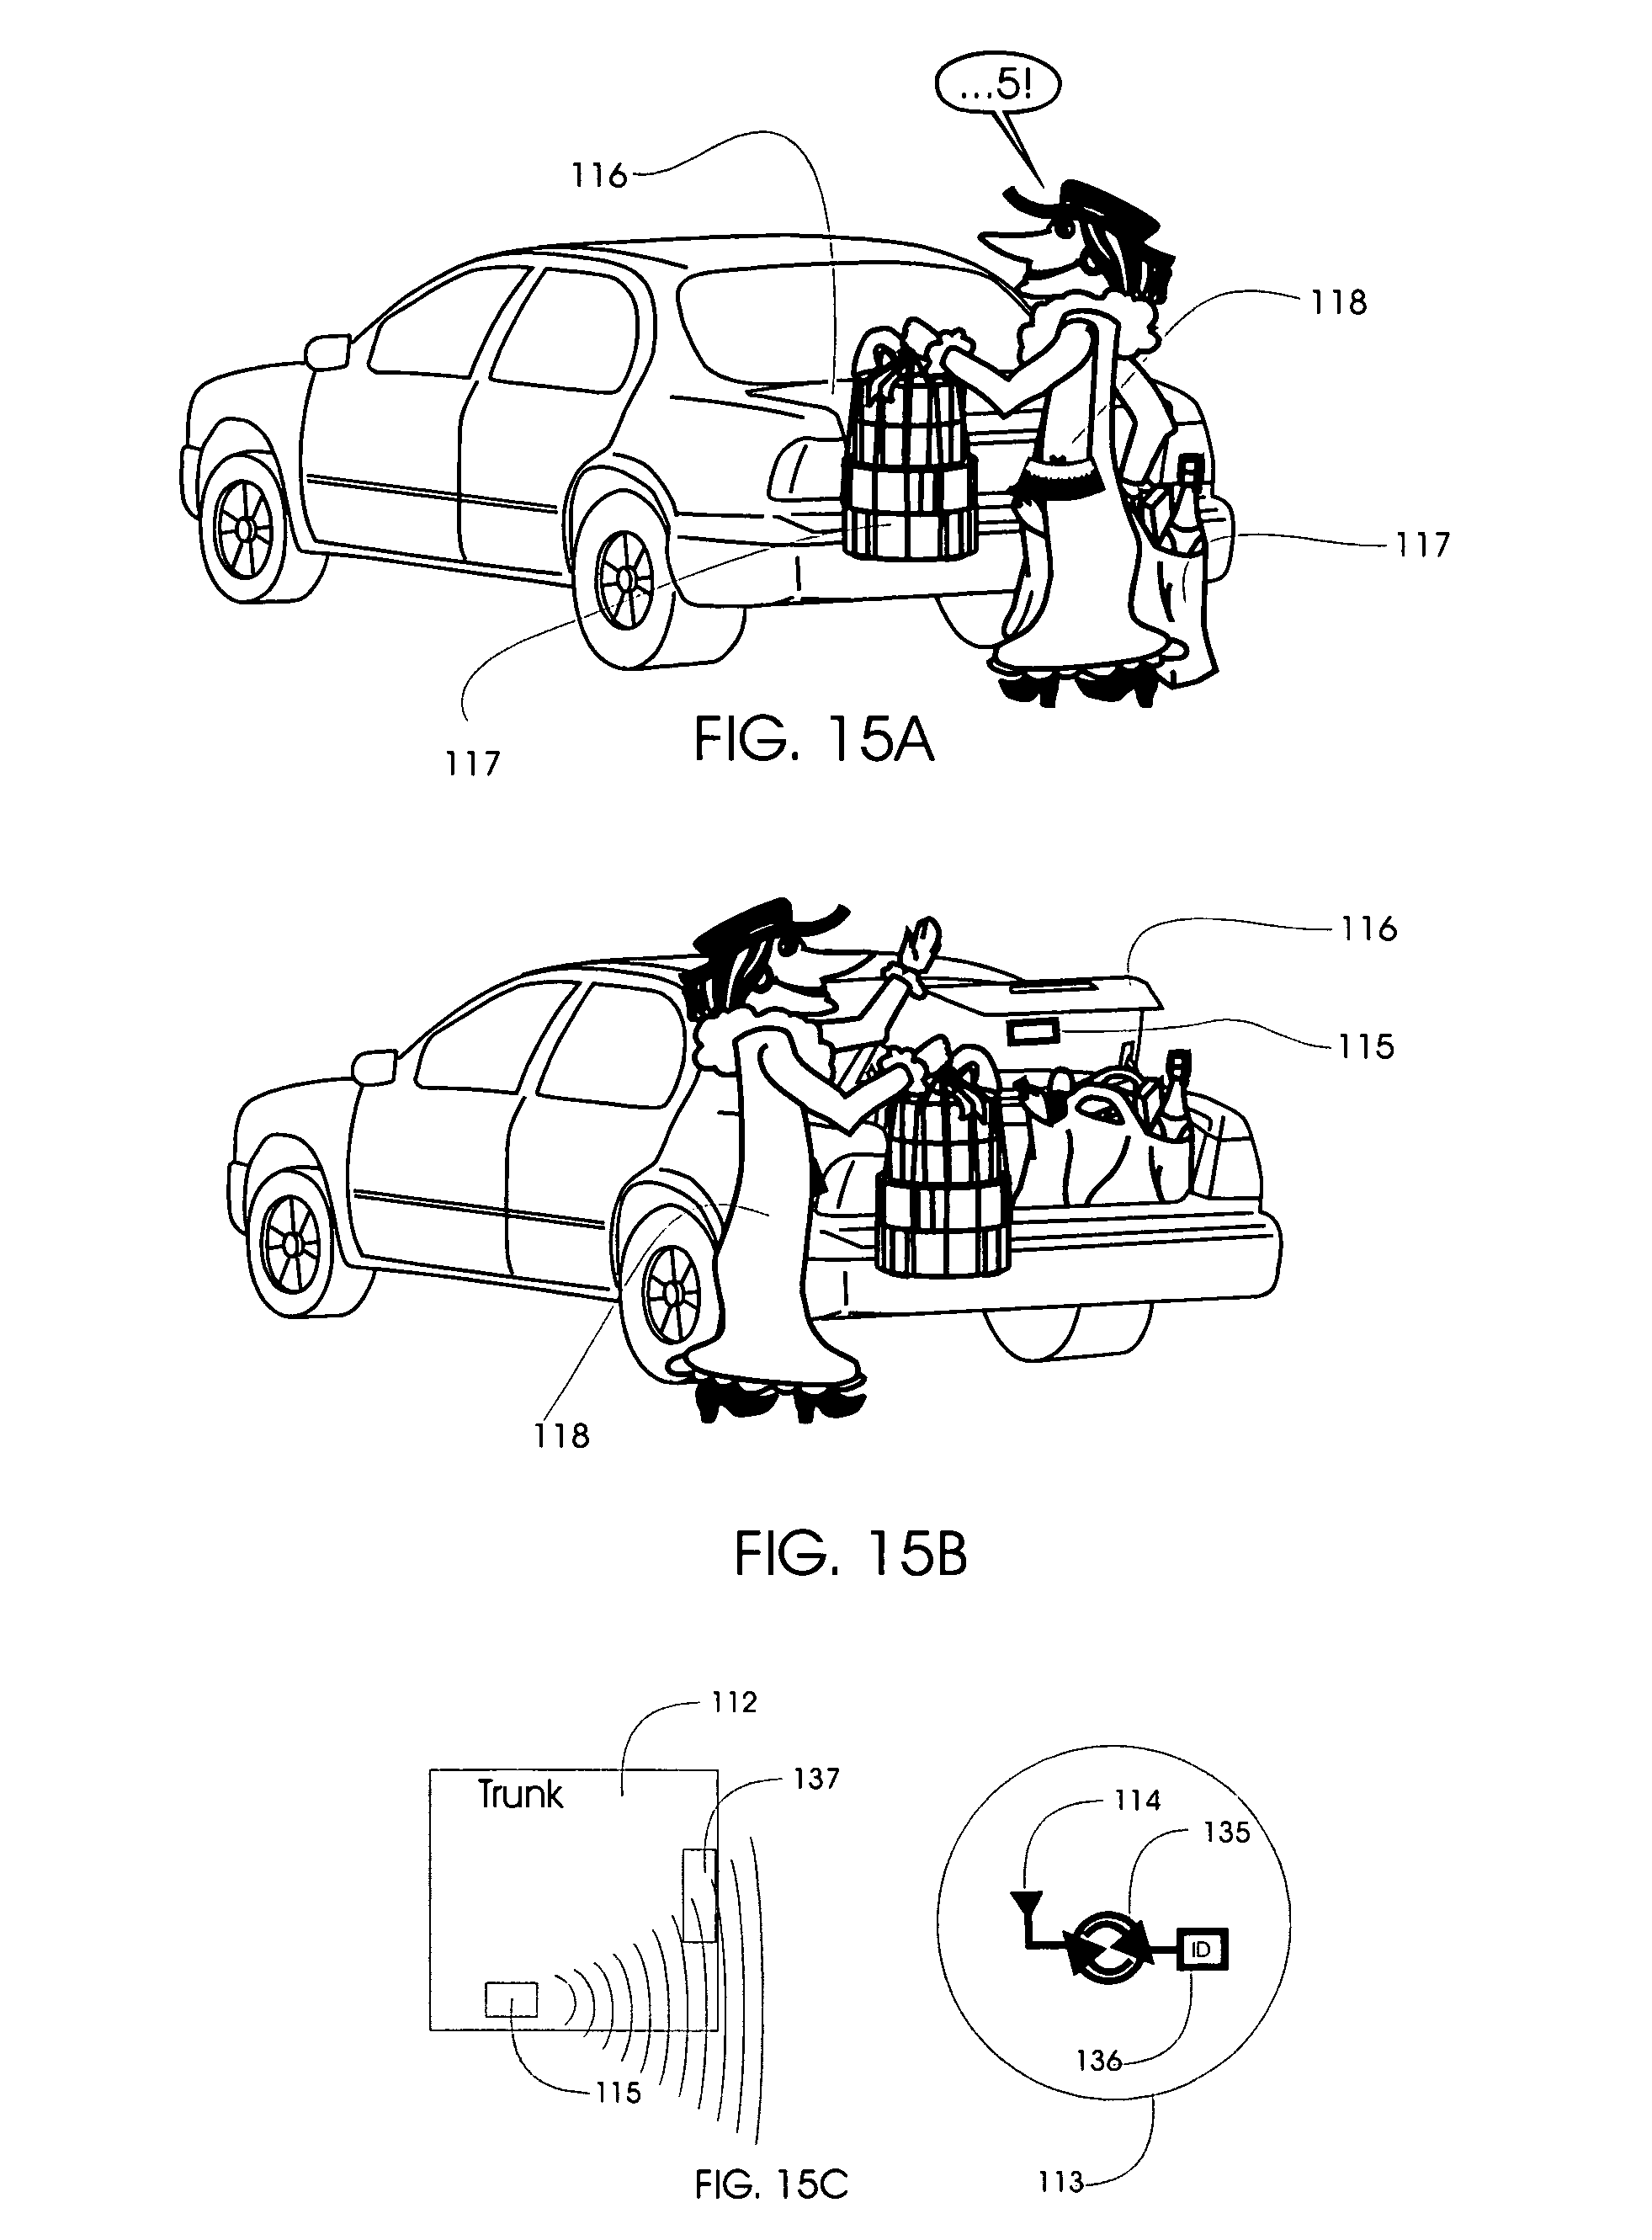 patent us 7 421 321 b2 Plaid Bus VW patent